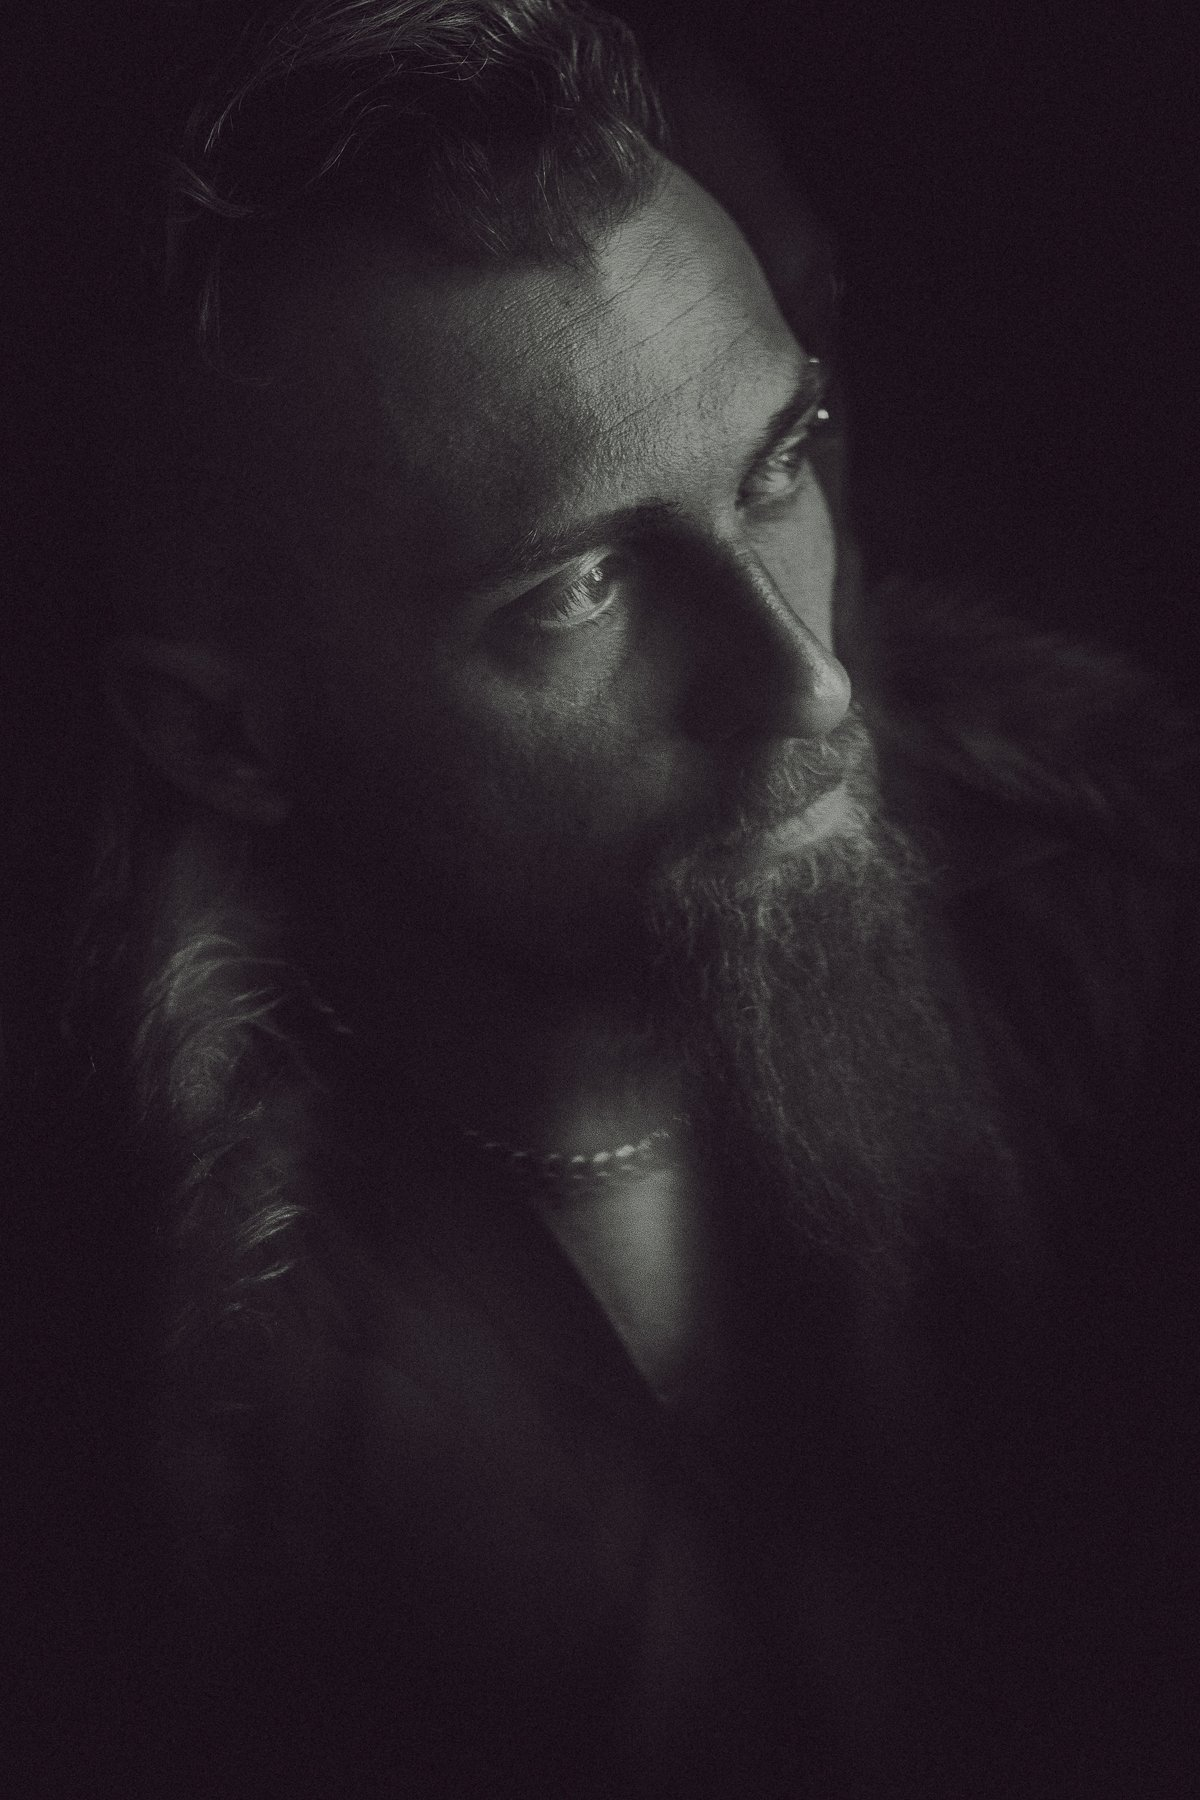 студия, жанр, портрет, театр, кино, портфолио, Санкт-Петербург, Питер, Степан Киянов фотограф